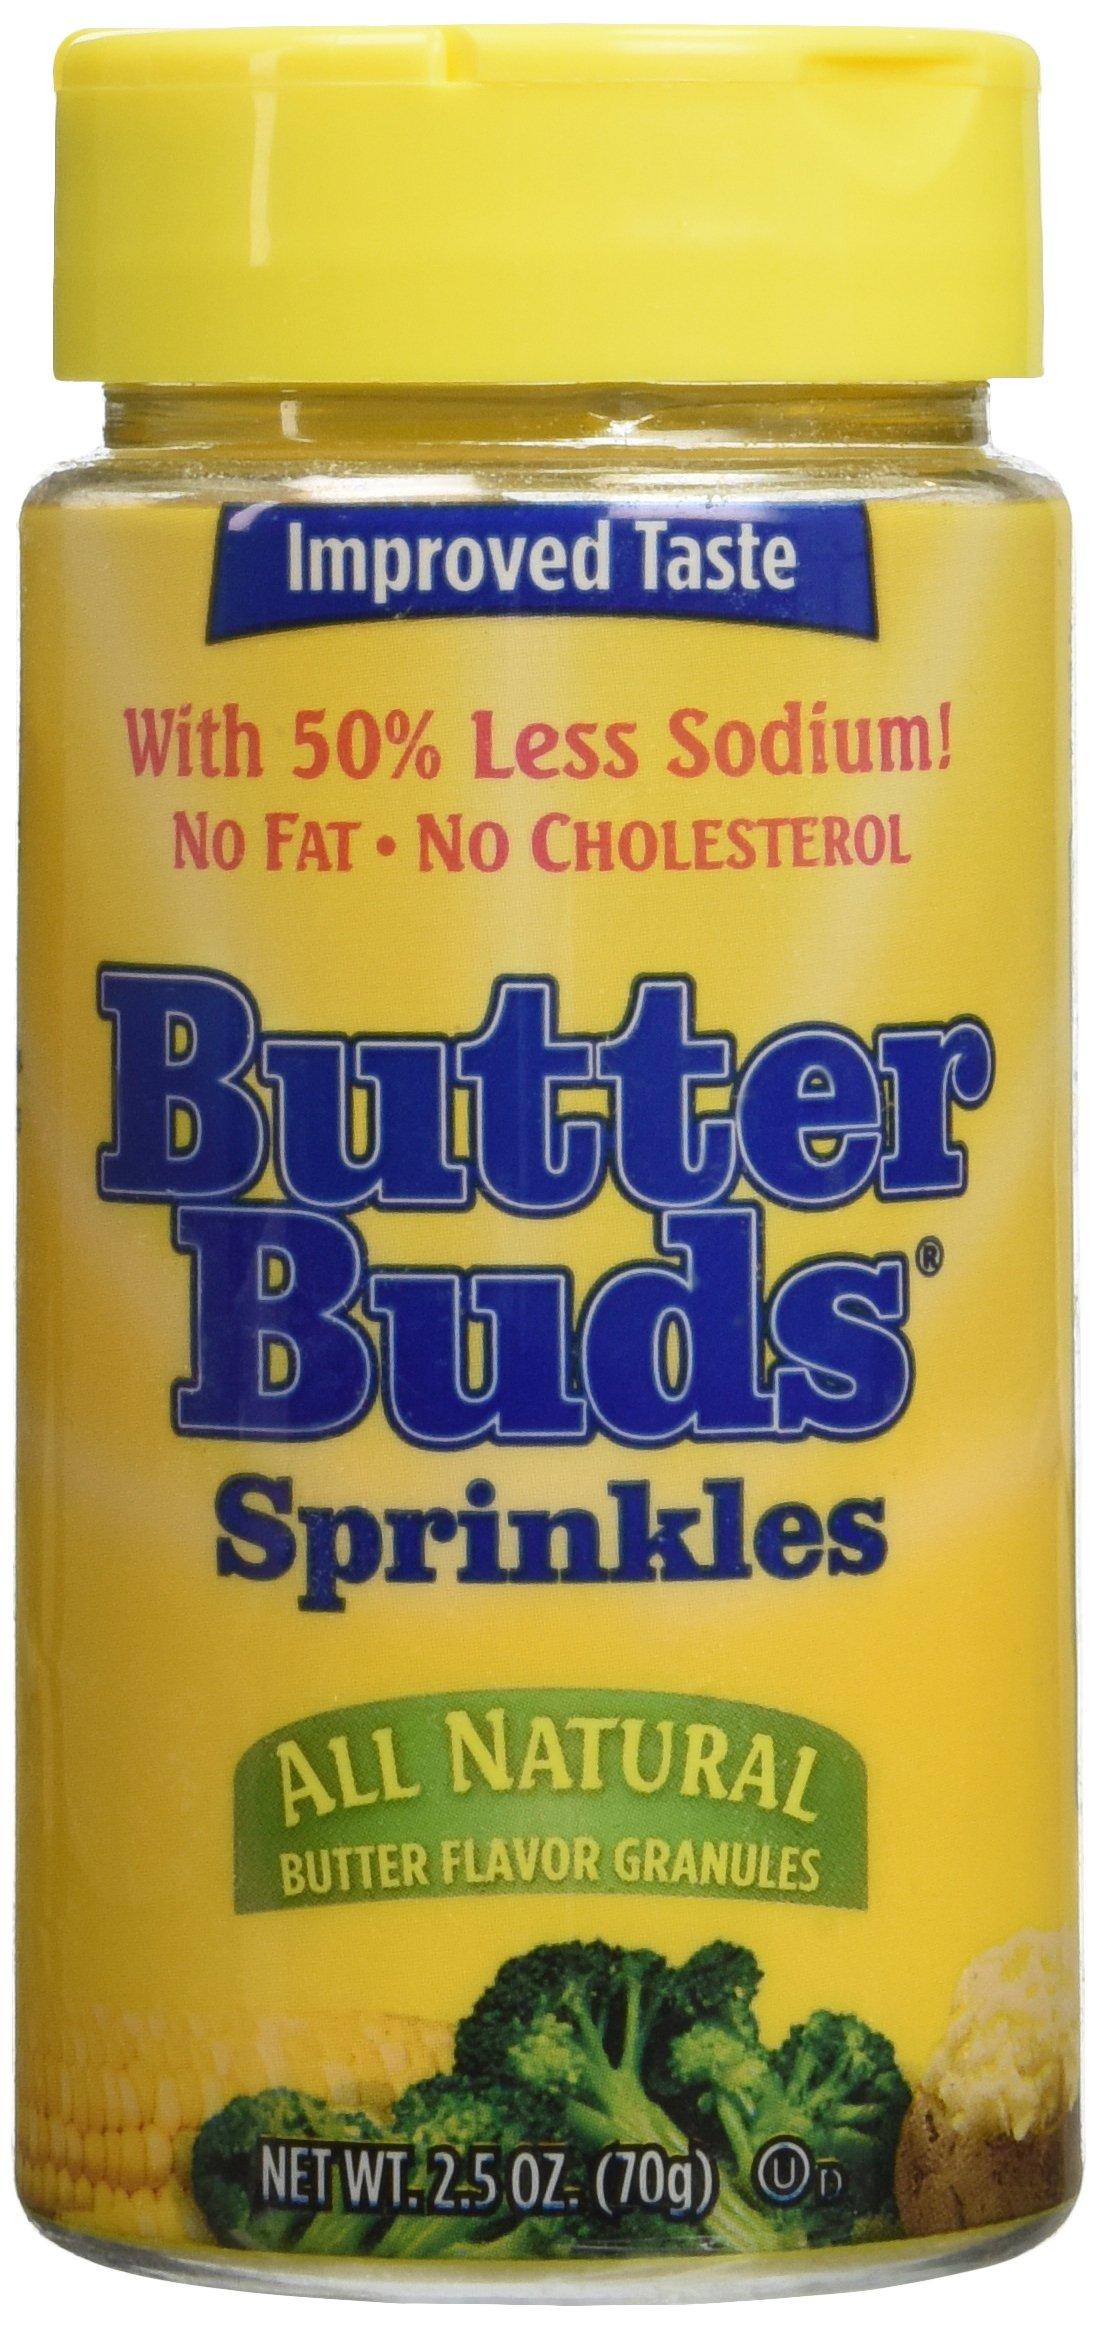 Butter Buds Butter Flavor Sprinkles Granules 2.5 Oz by Butterbuds